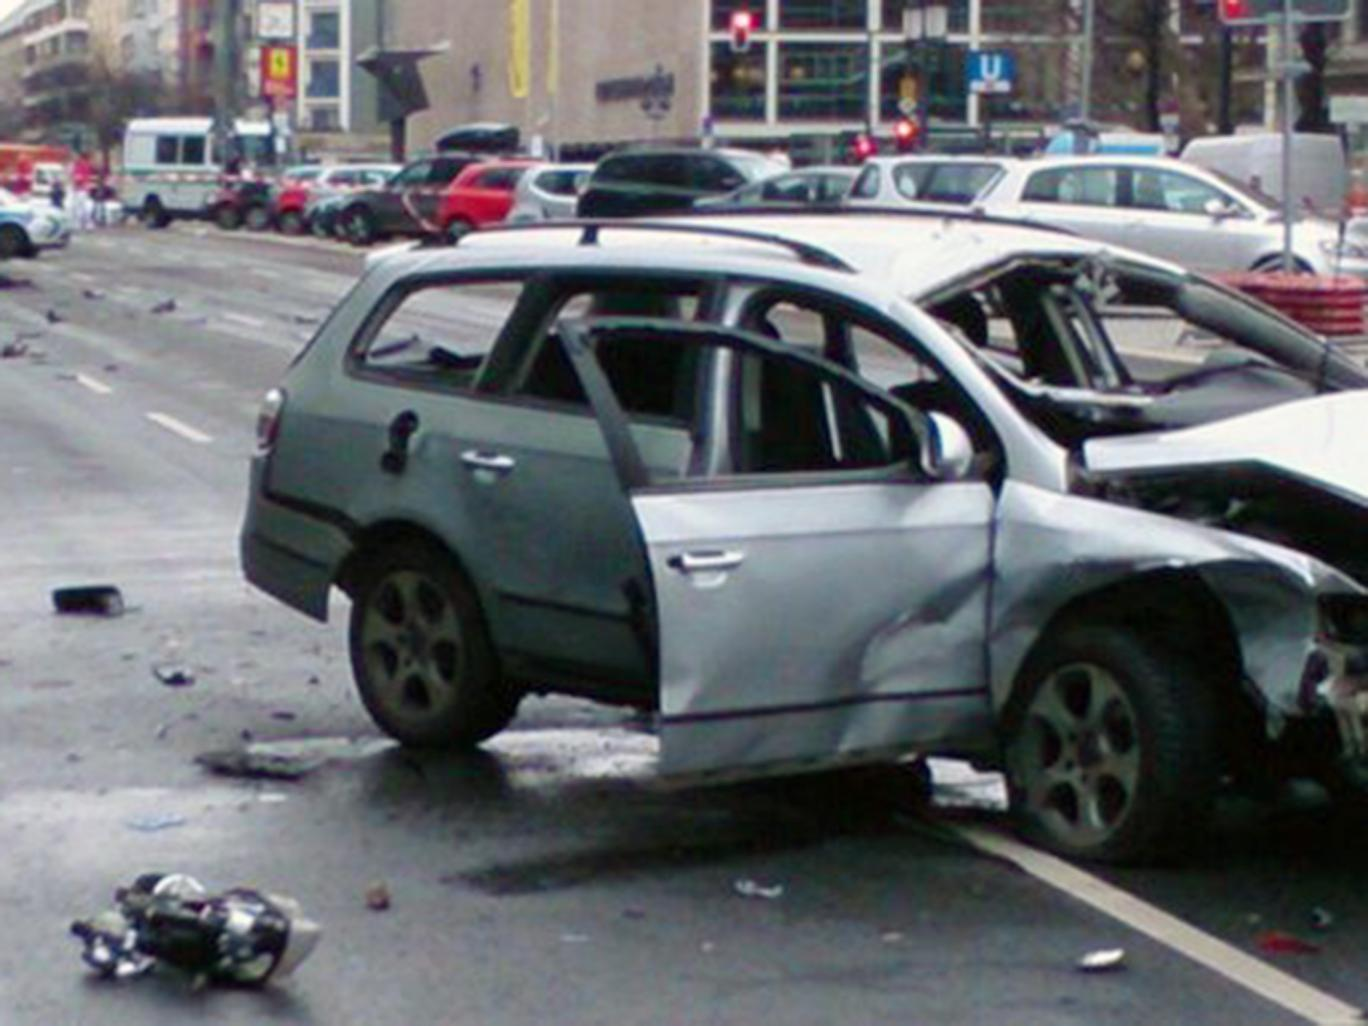 Berlino: Auto Esplode a Charlottenburg: Terrorismo?